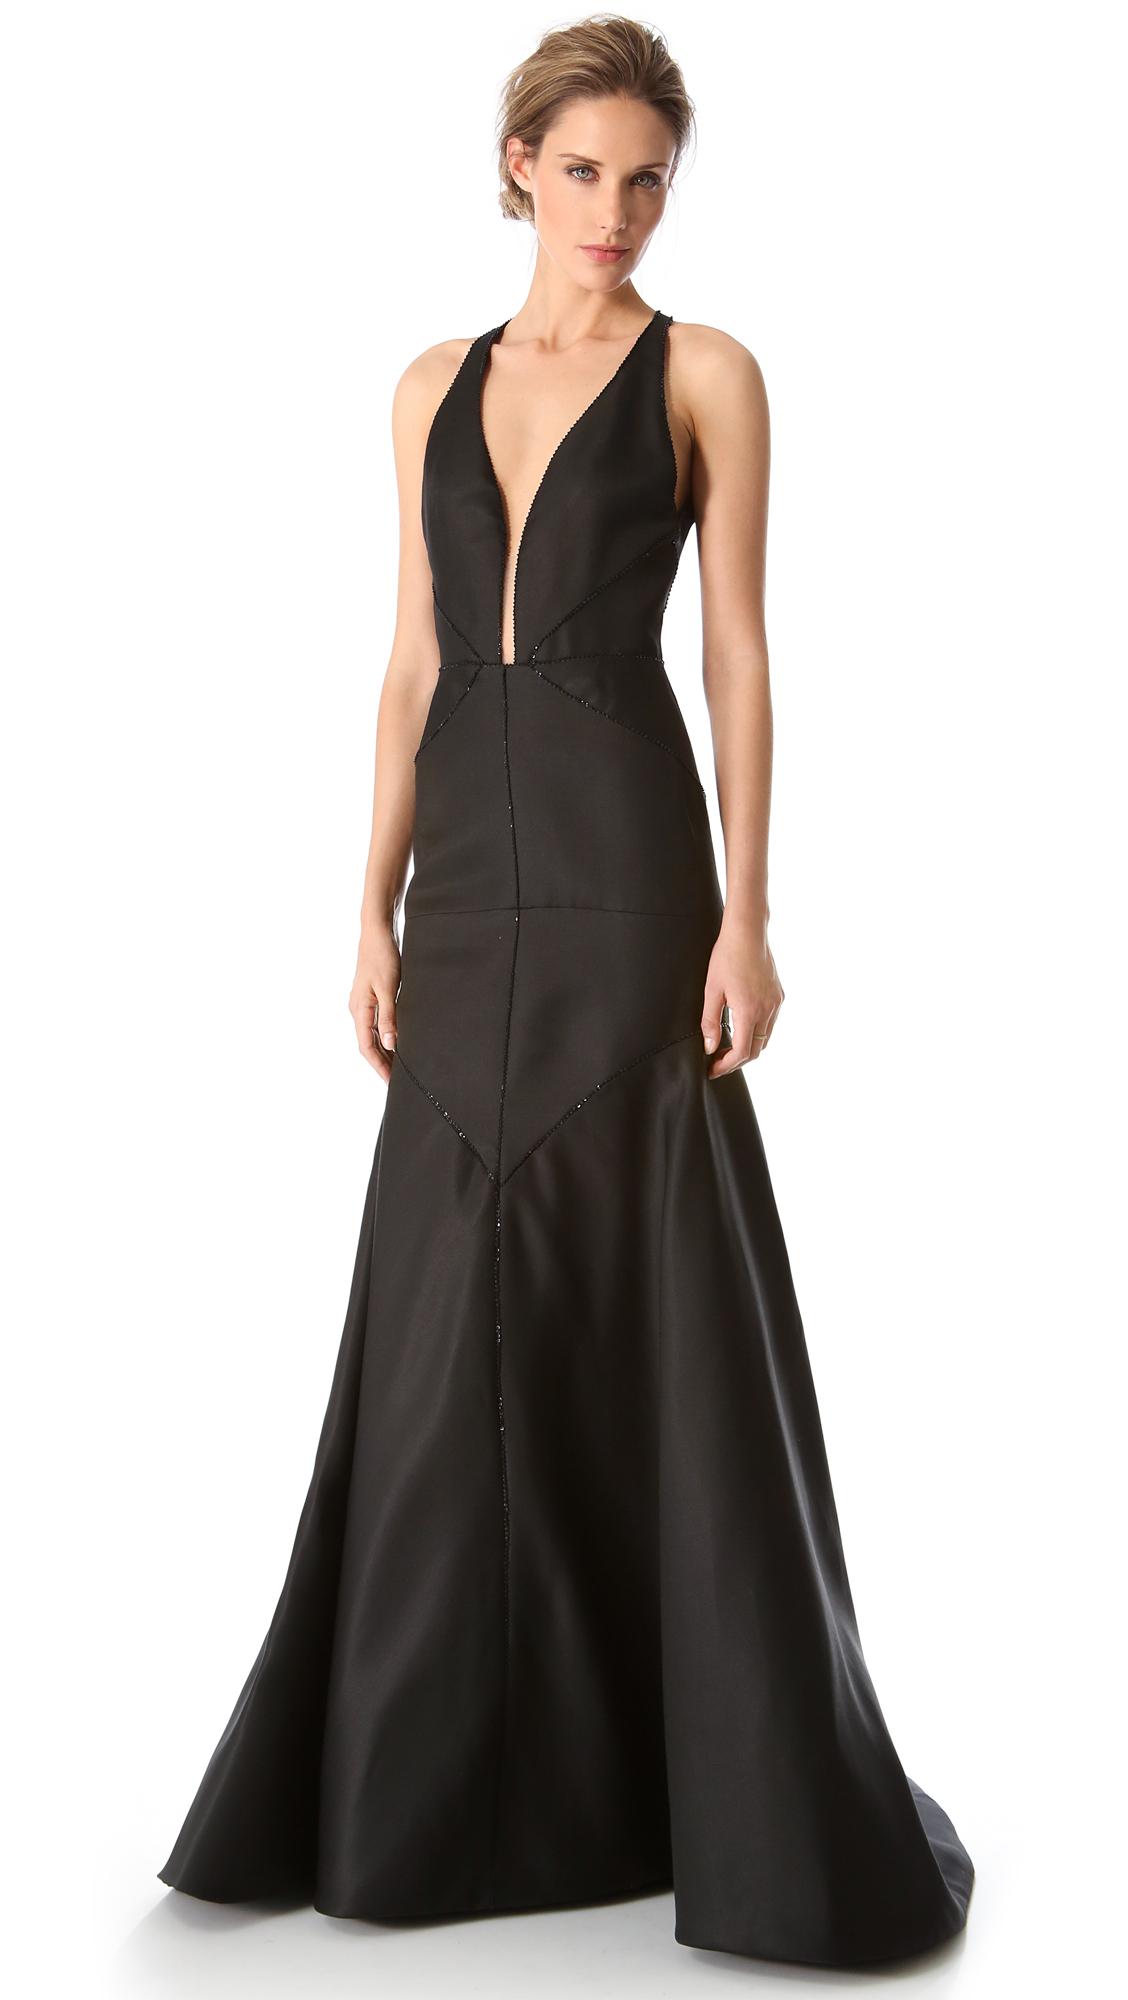 b62167ea9b10 Lyst - J. Mendel Deep V Halter Gown in Black